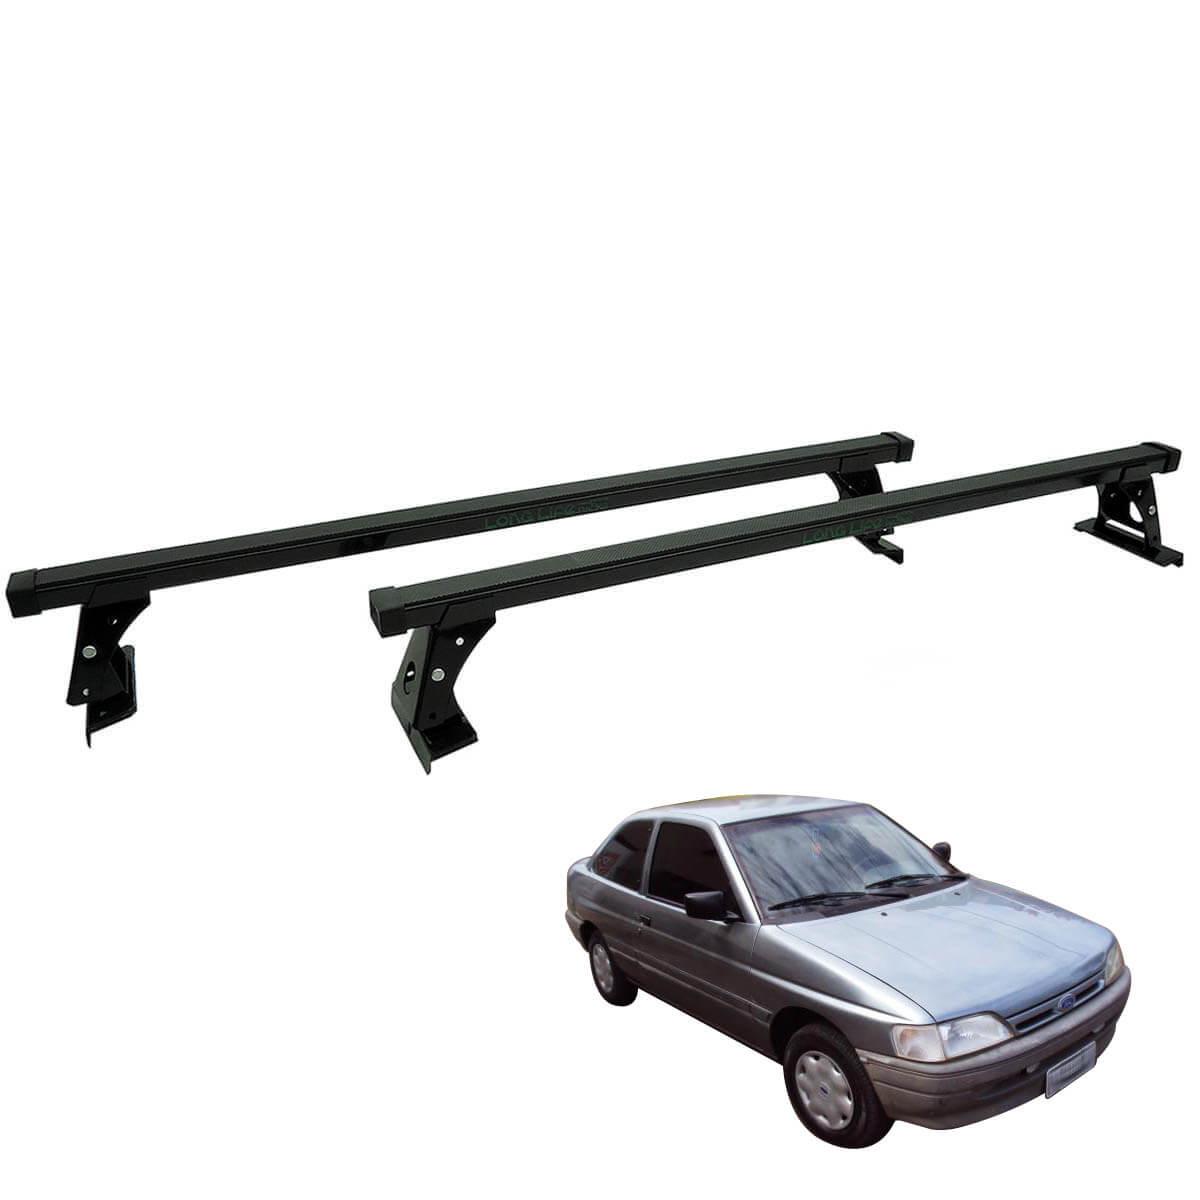 Rack de teto Escort ou Logus 2 portas 1993 a 2000 Long Life aço